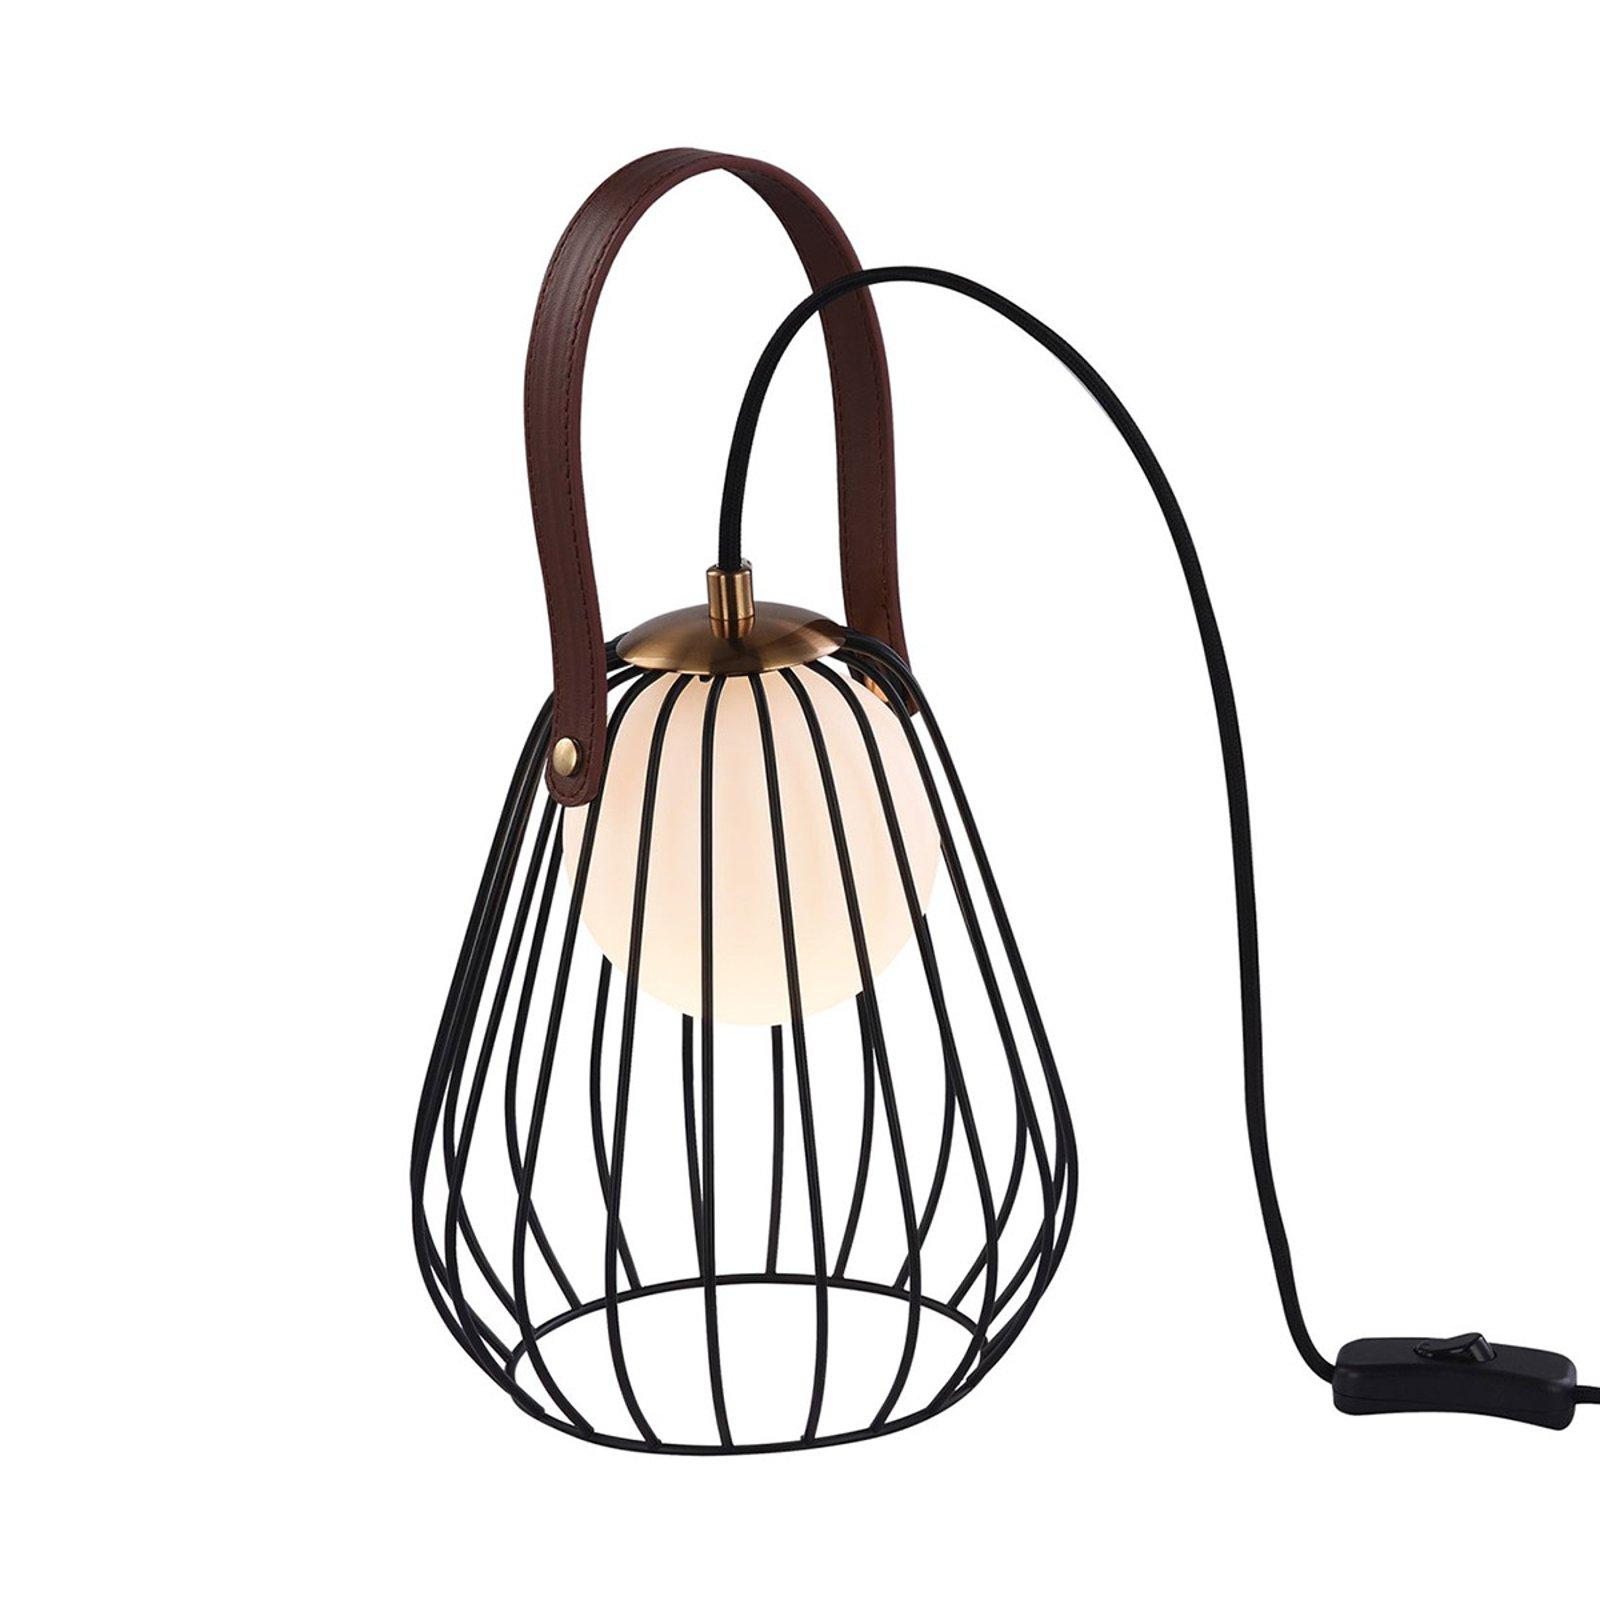 Indiana bordlampe med svart bur-skjerm